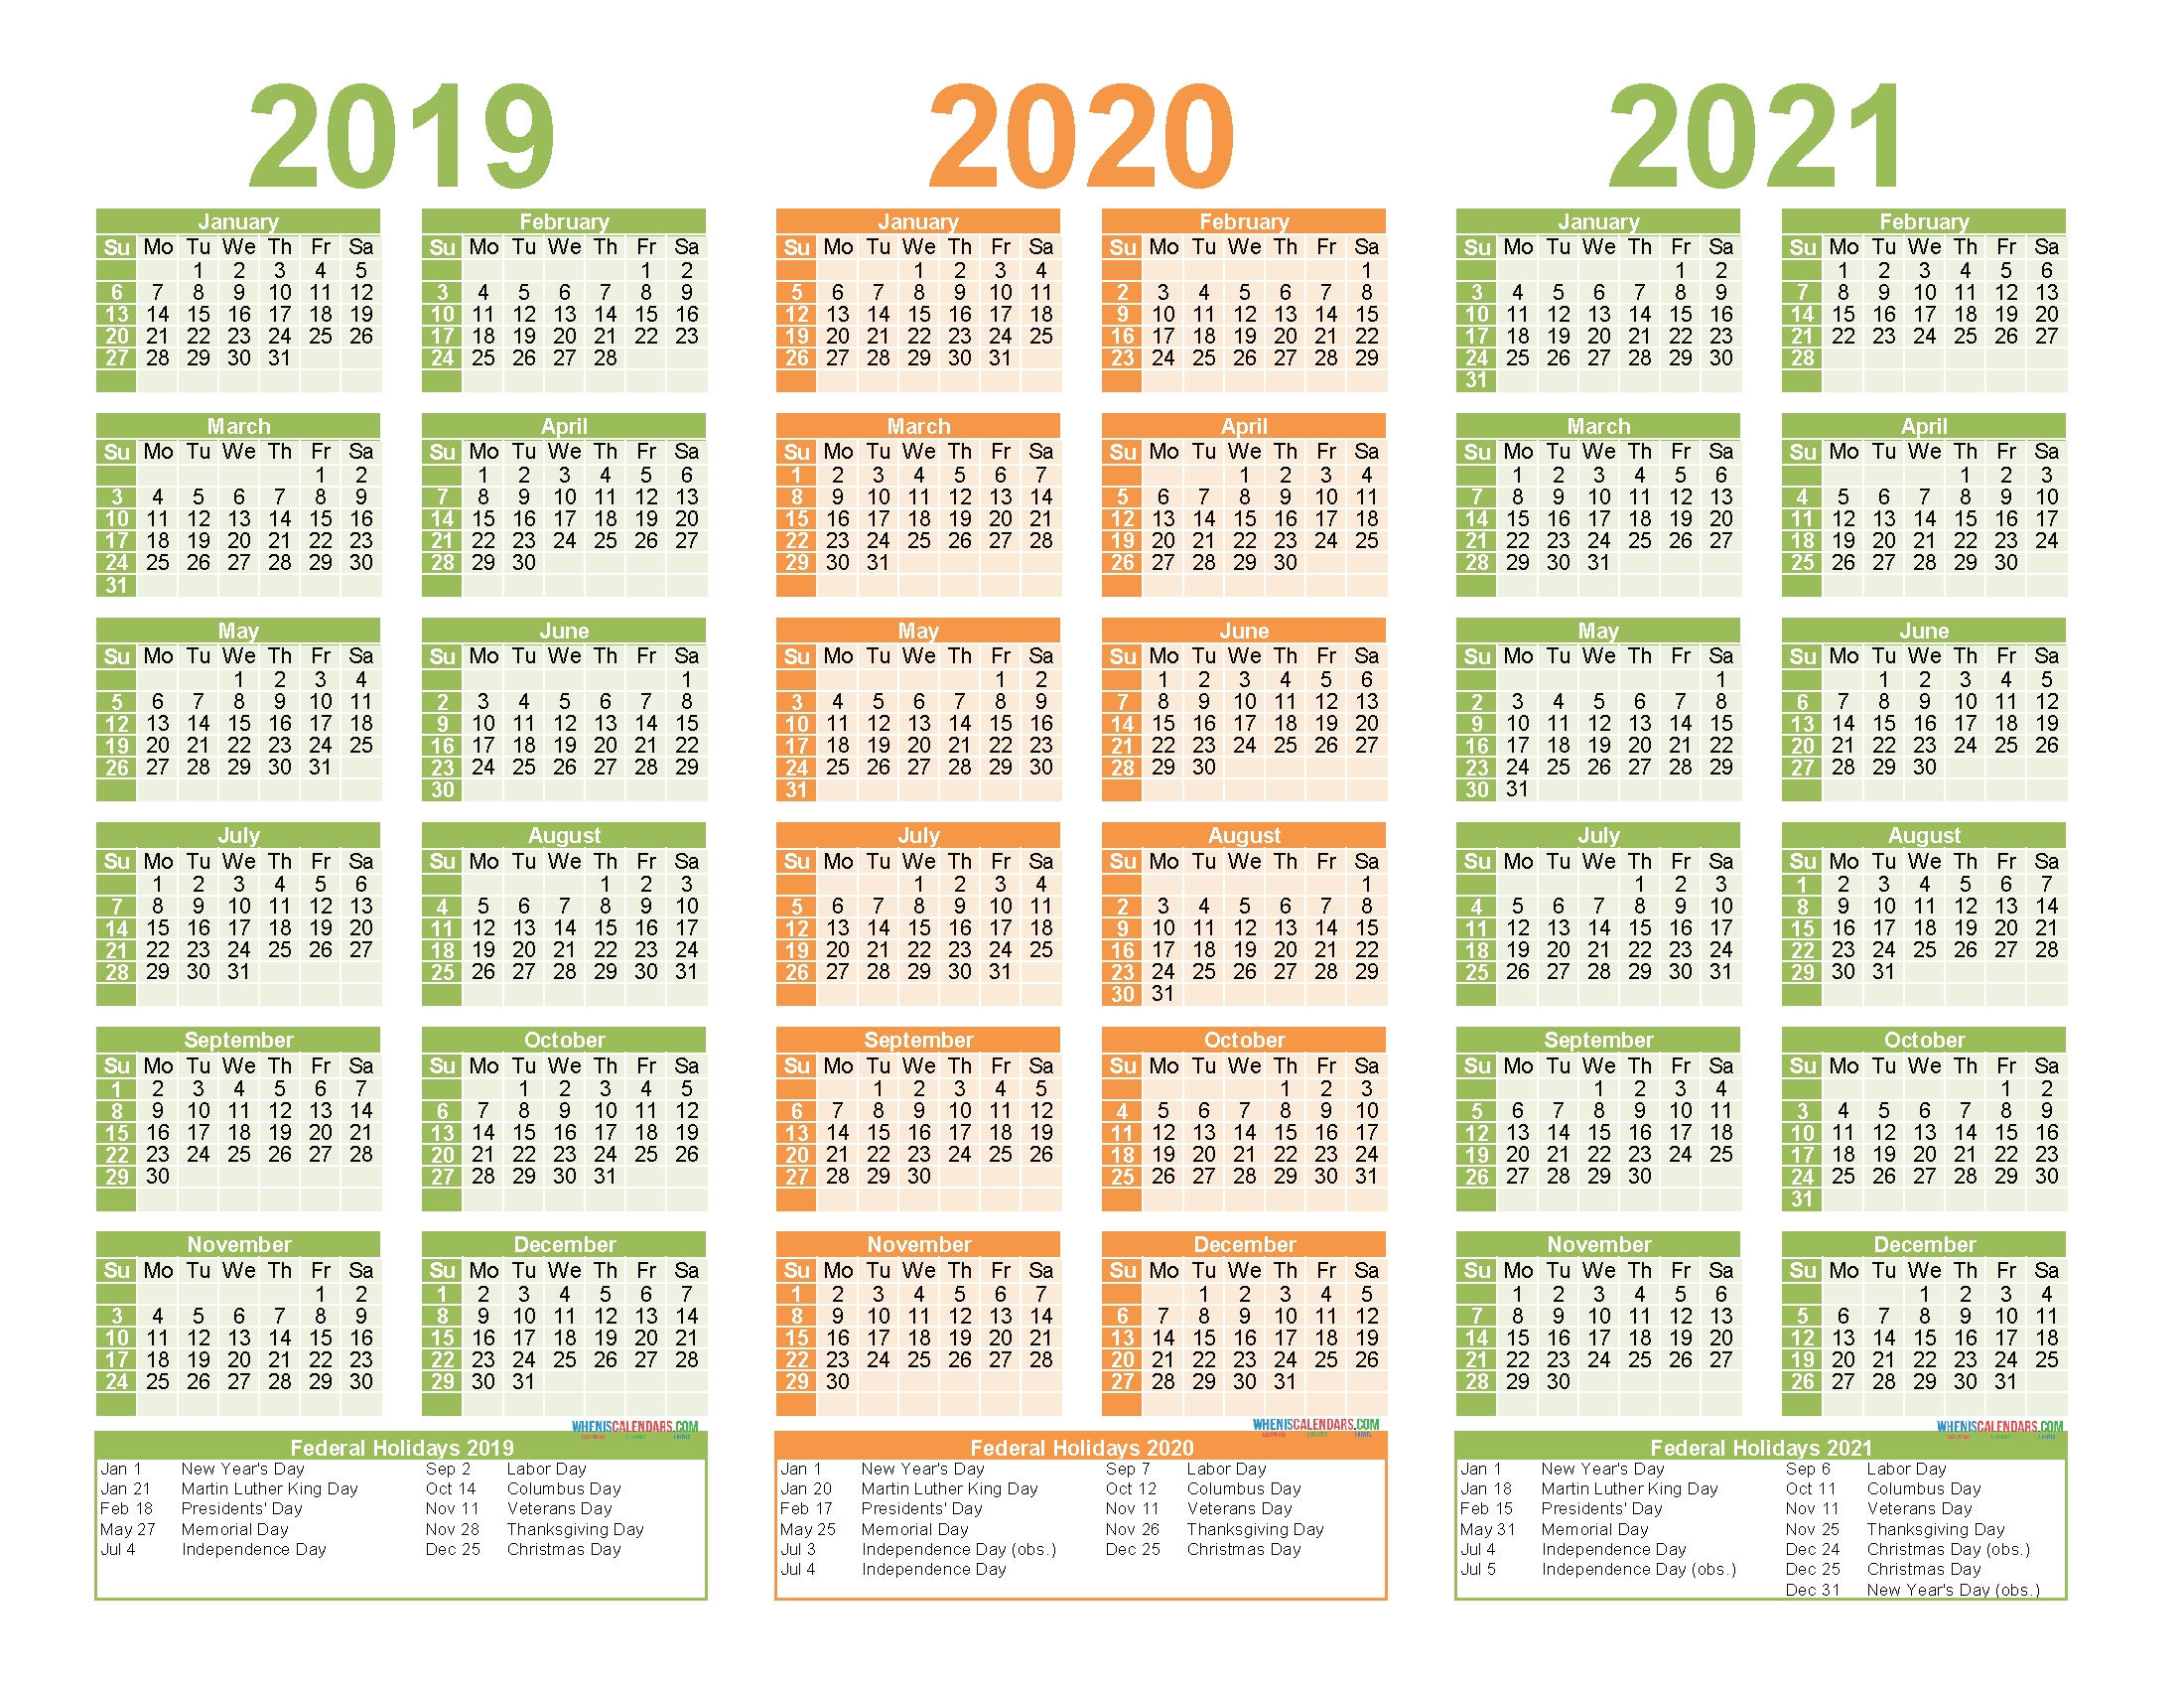 2019 to 2021 calendar printable free pdf, word, image – free